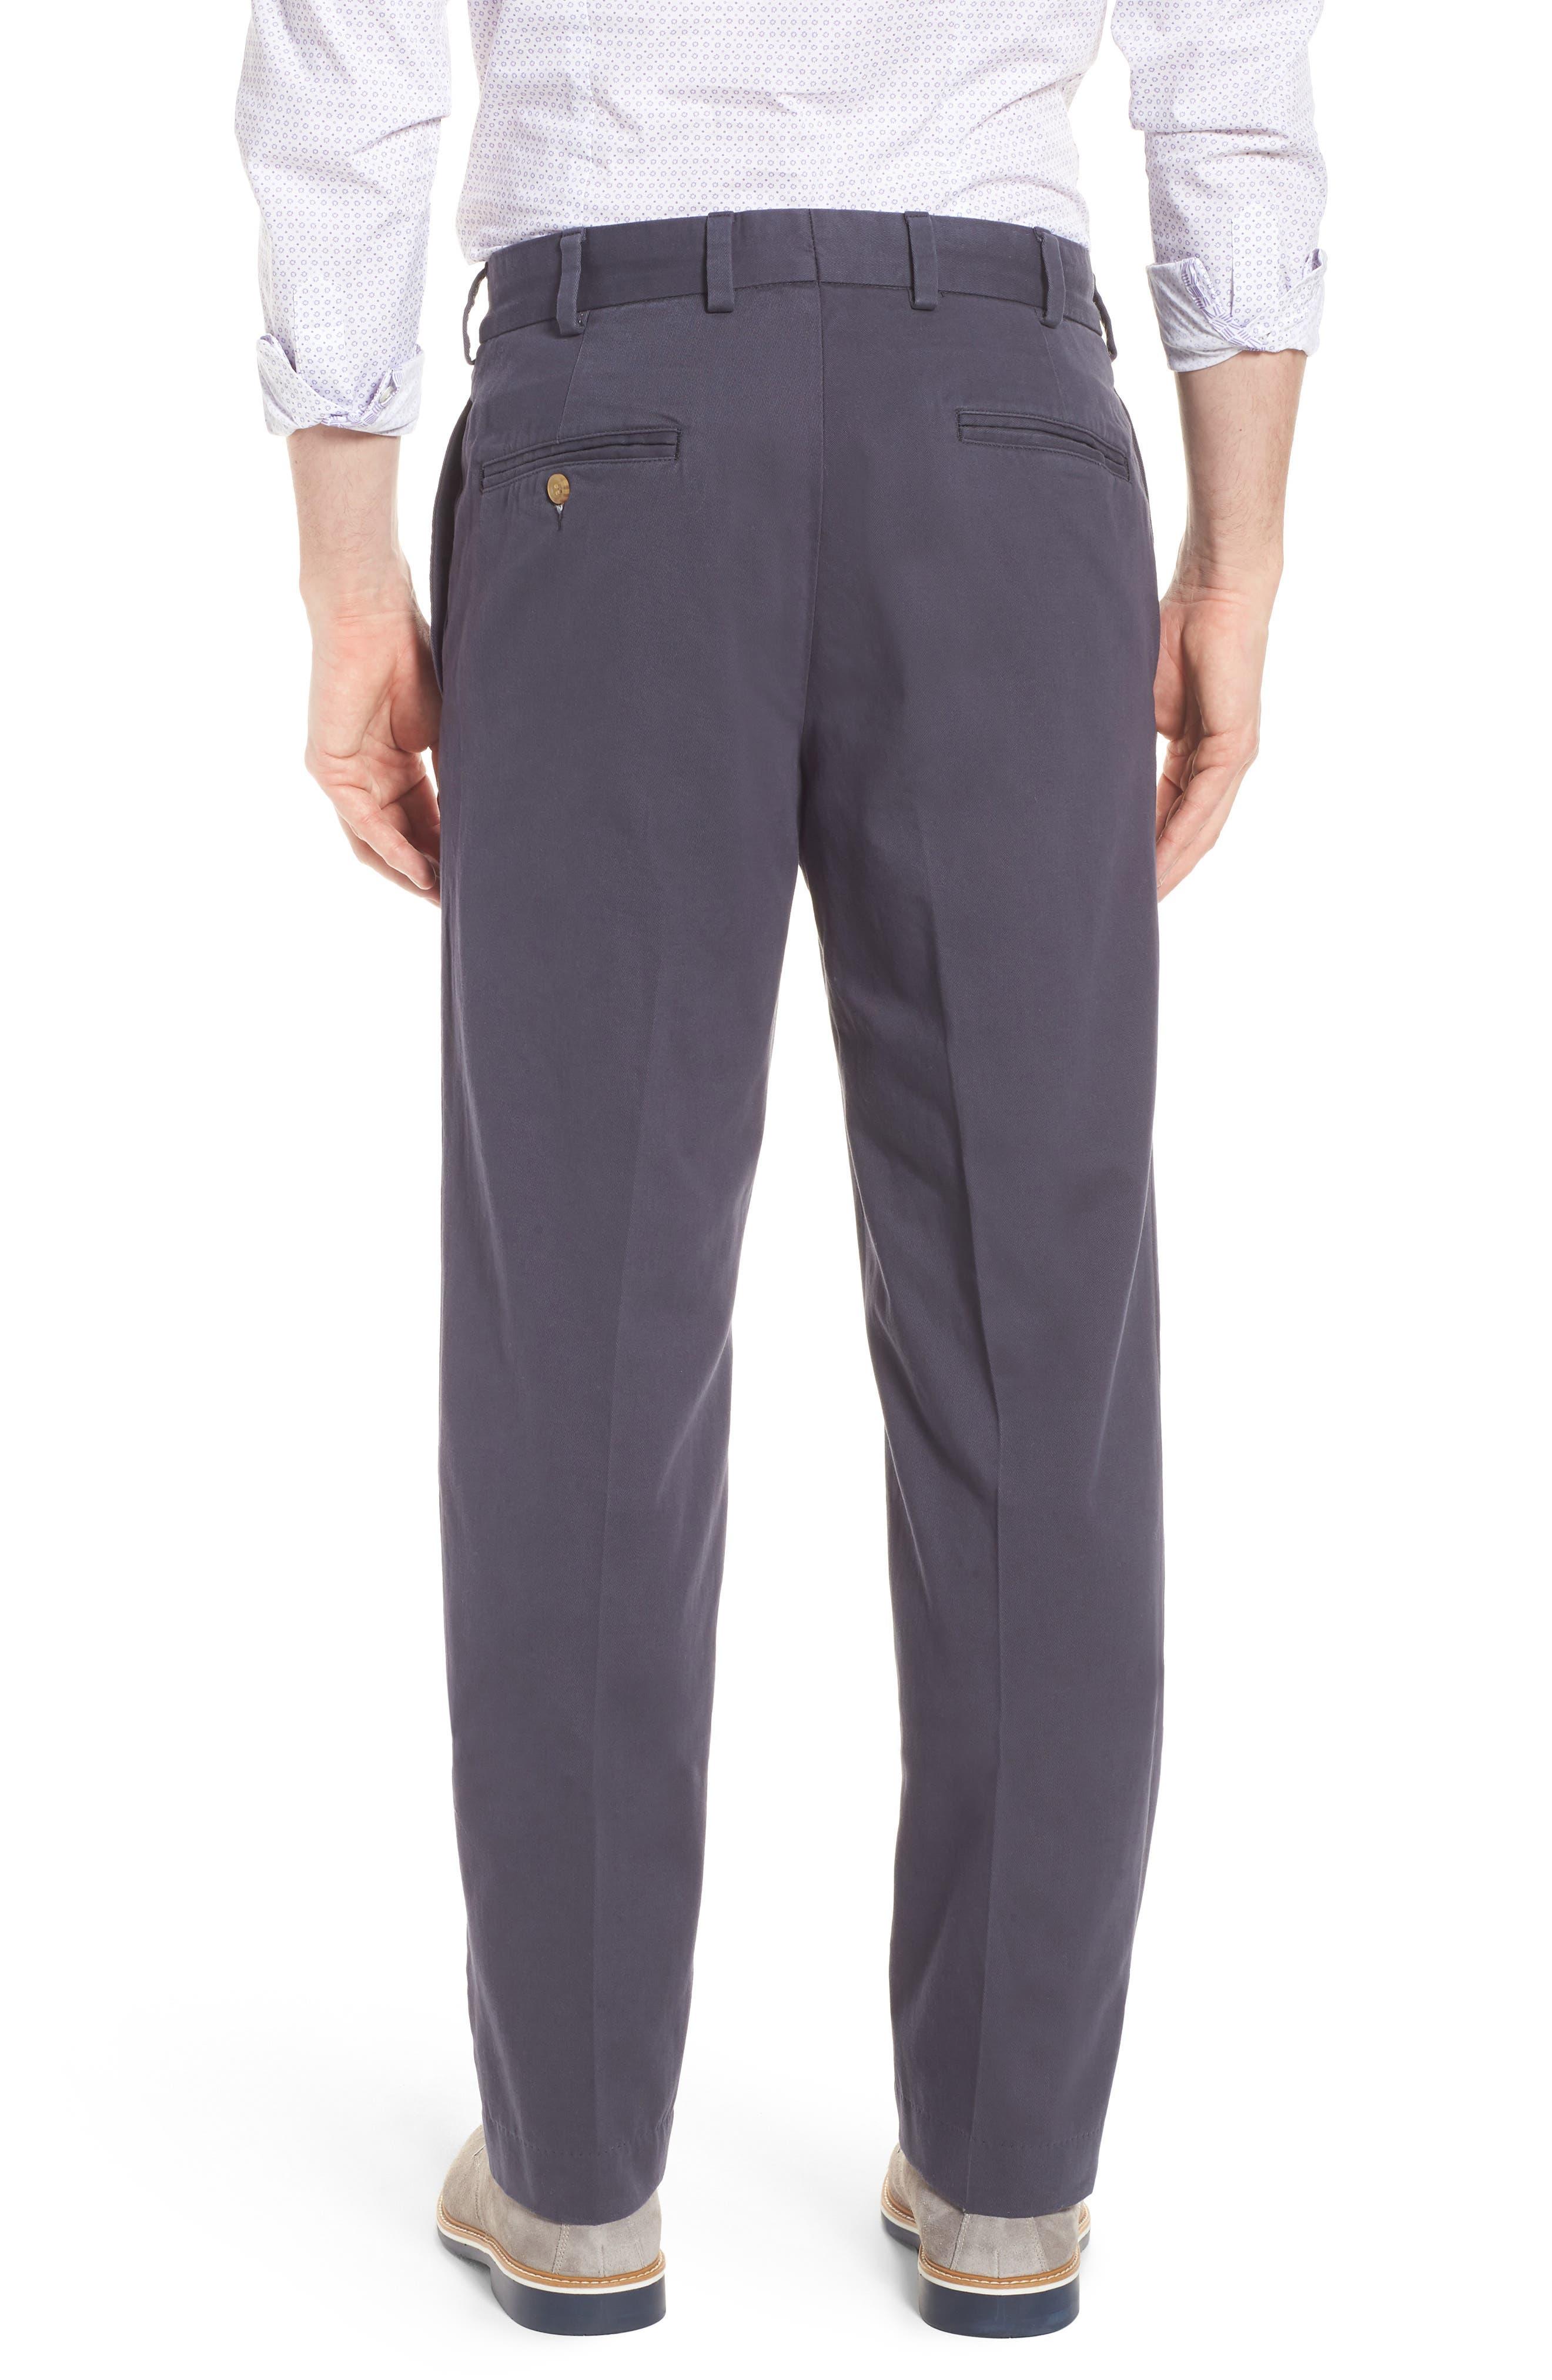 M2 Classic Fit Flat Front Vintage Twill Pants,                             Alternate thumbnail 2, color,